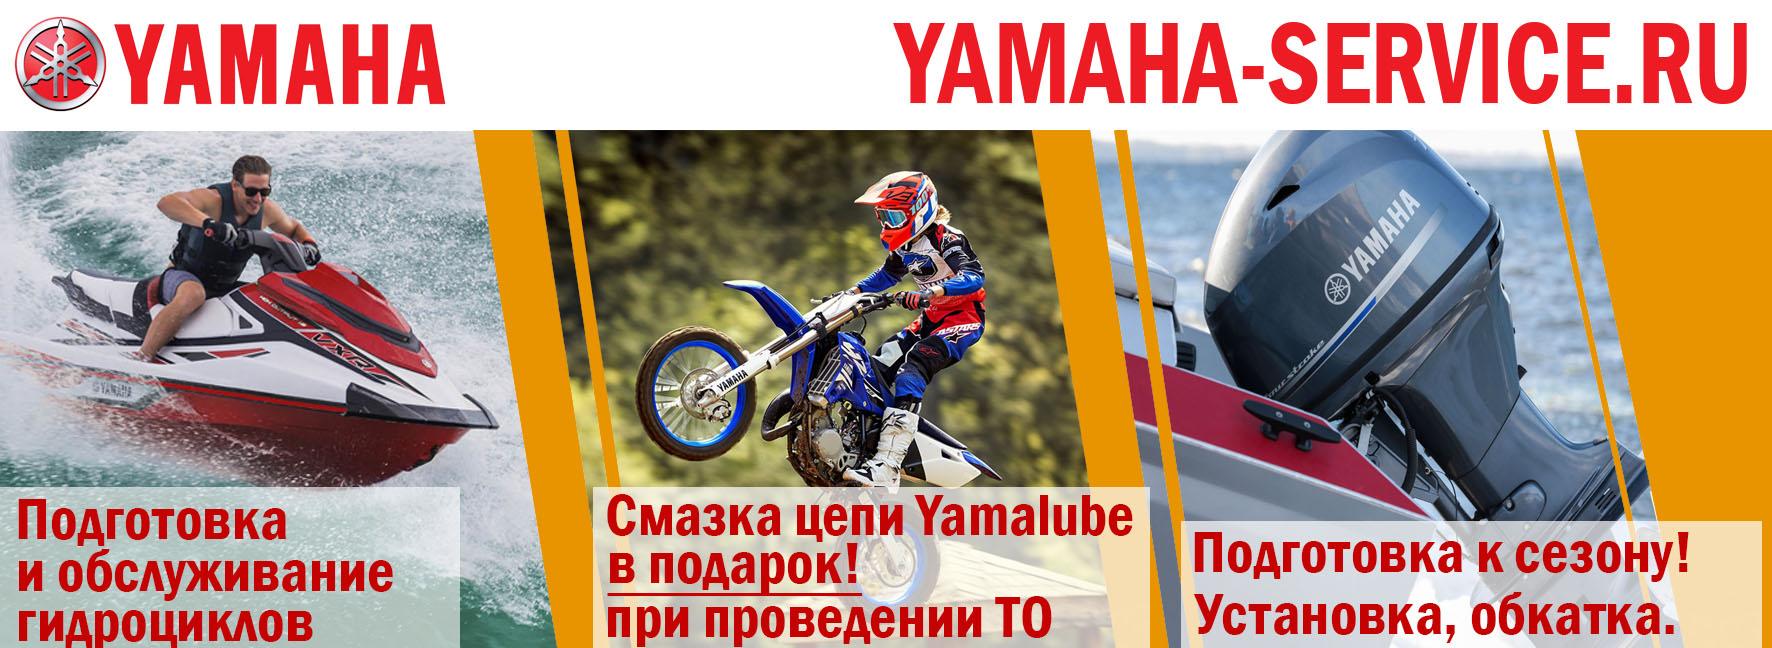 Акции Сервиса Yamaha